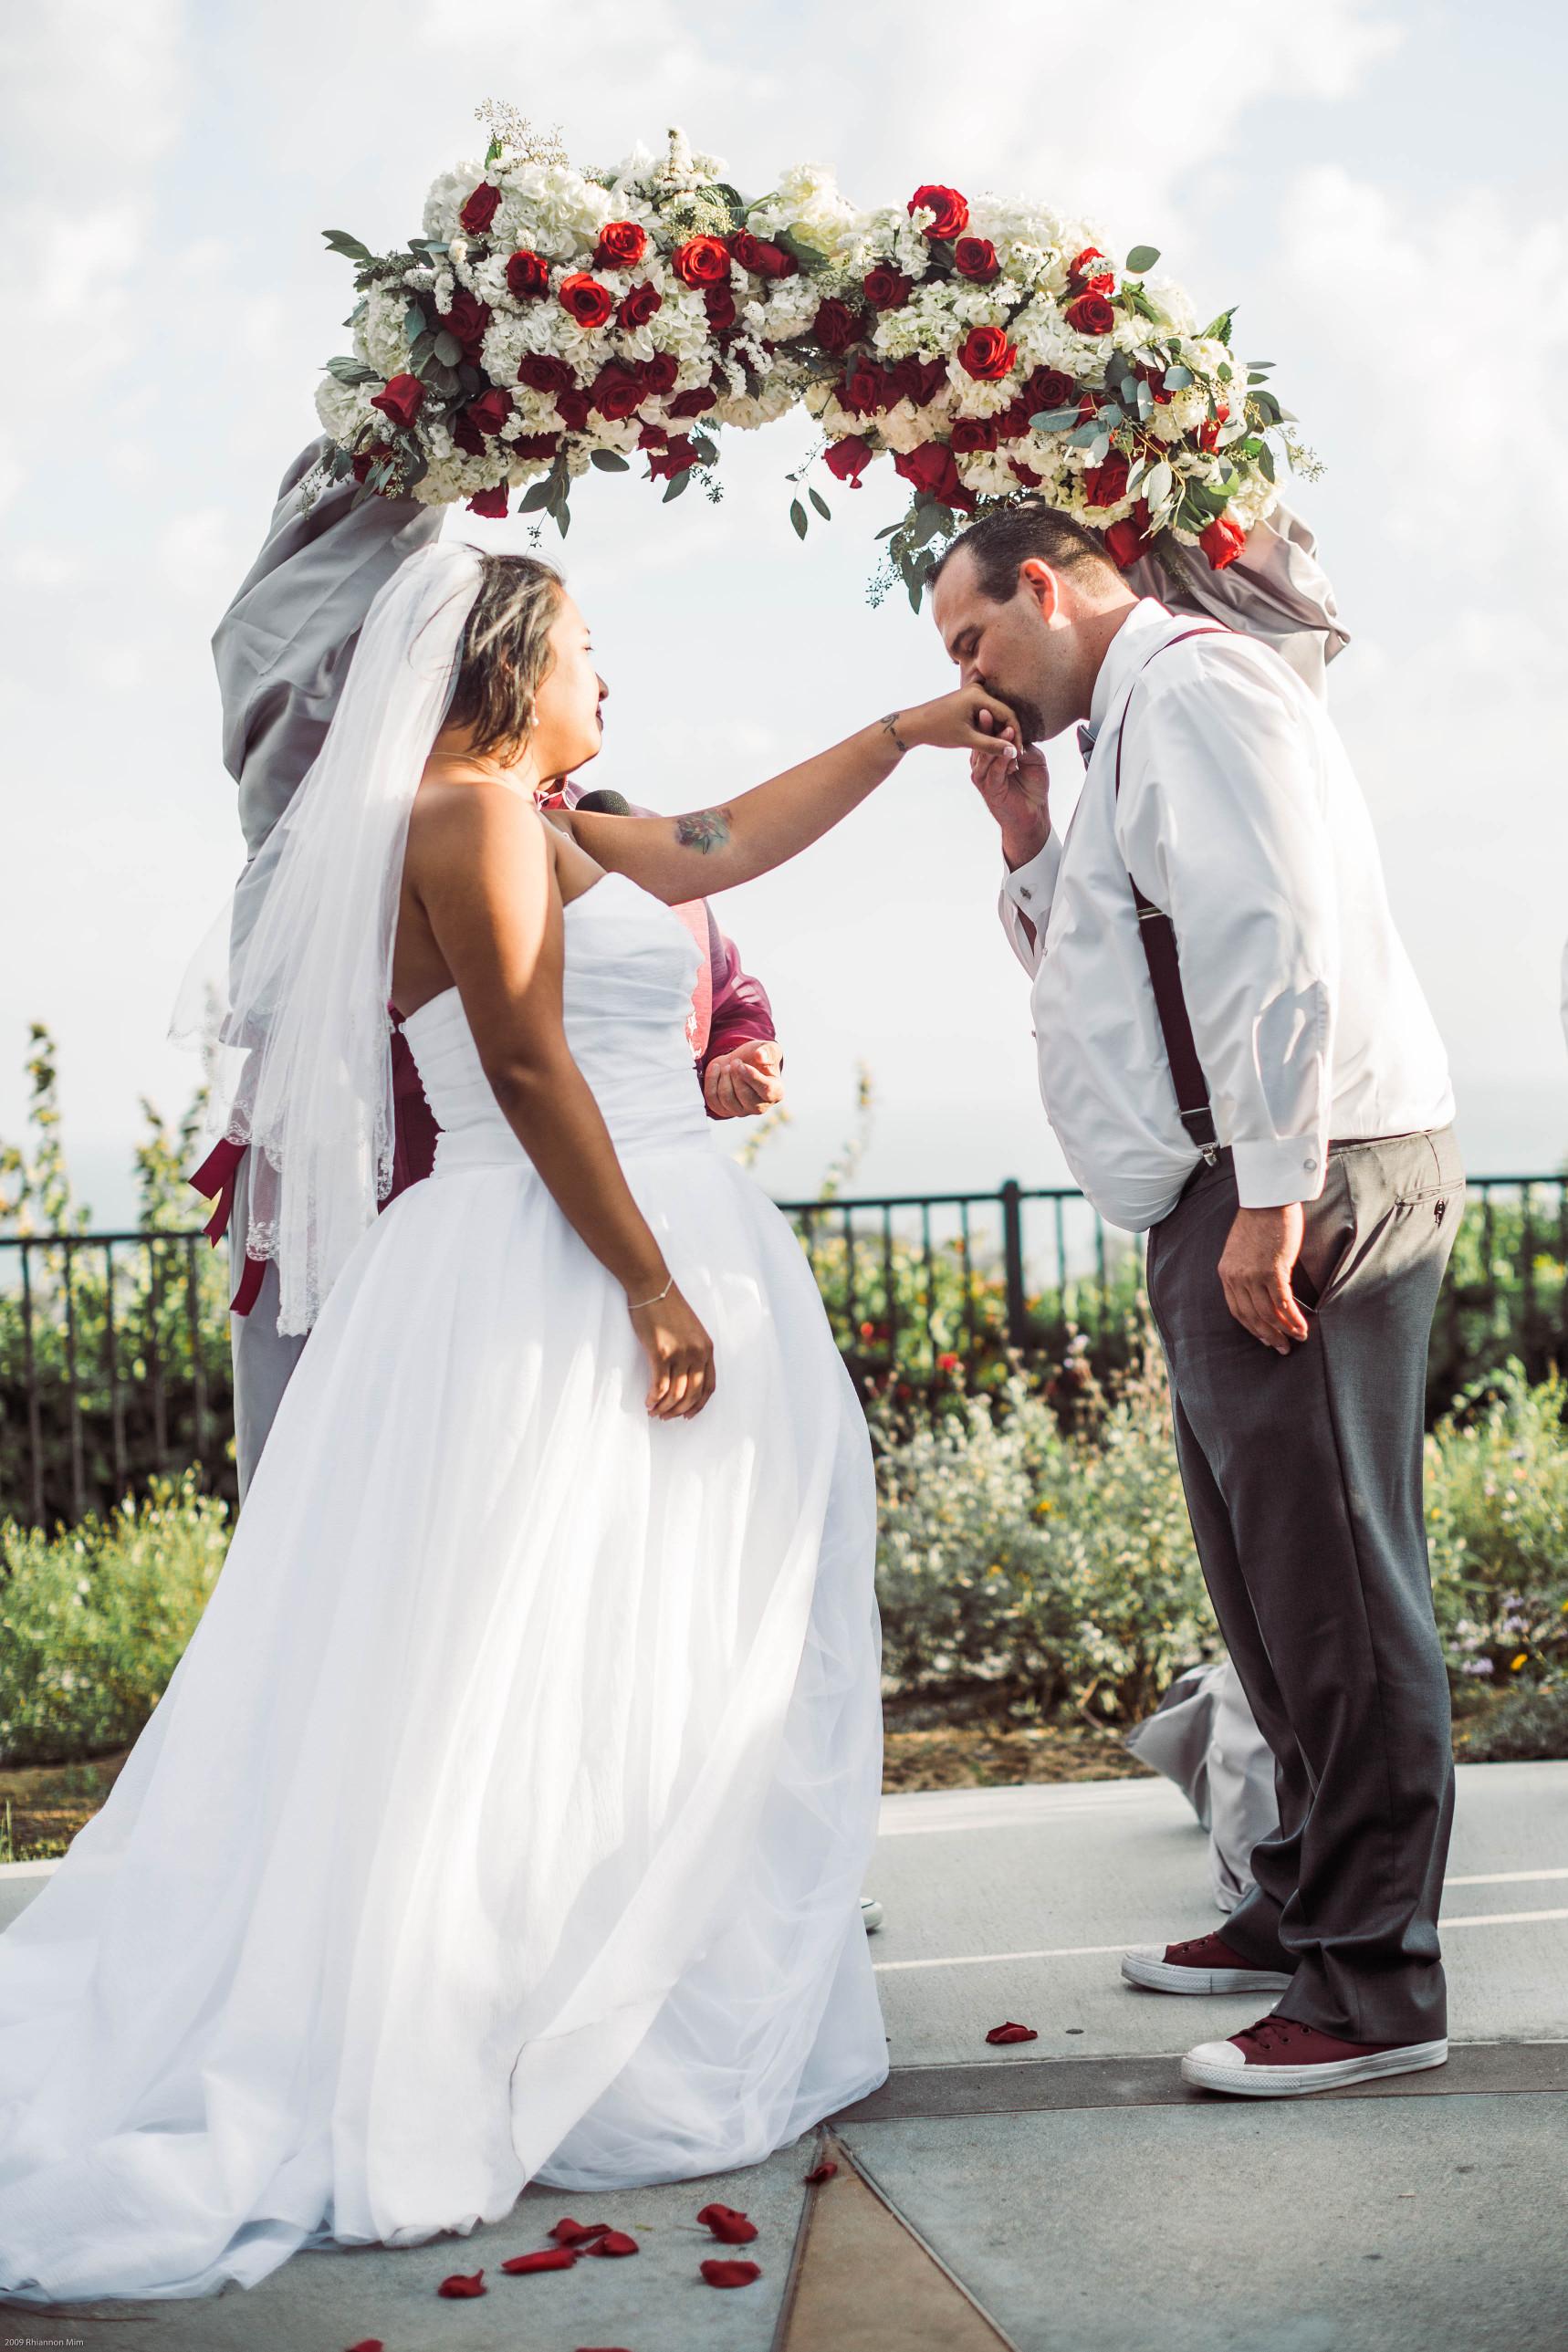 20170909_Wedding_0879